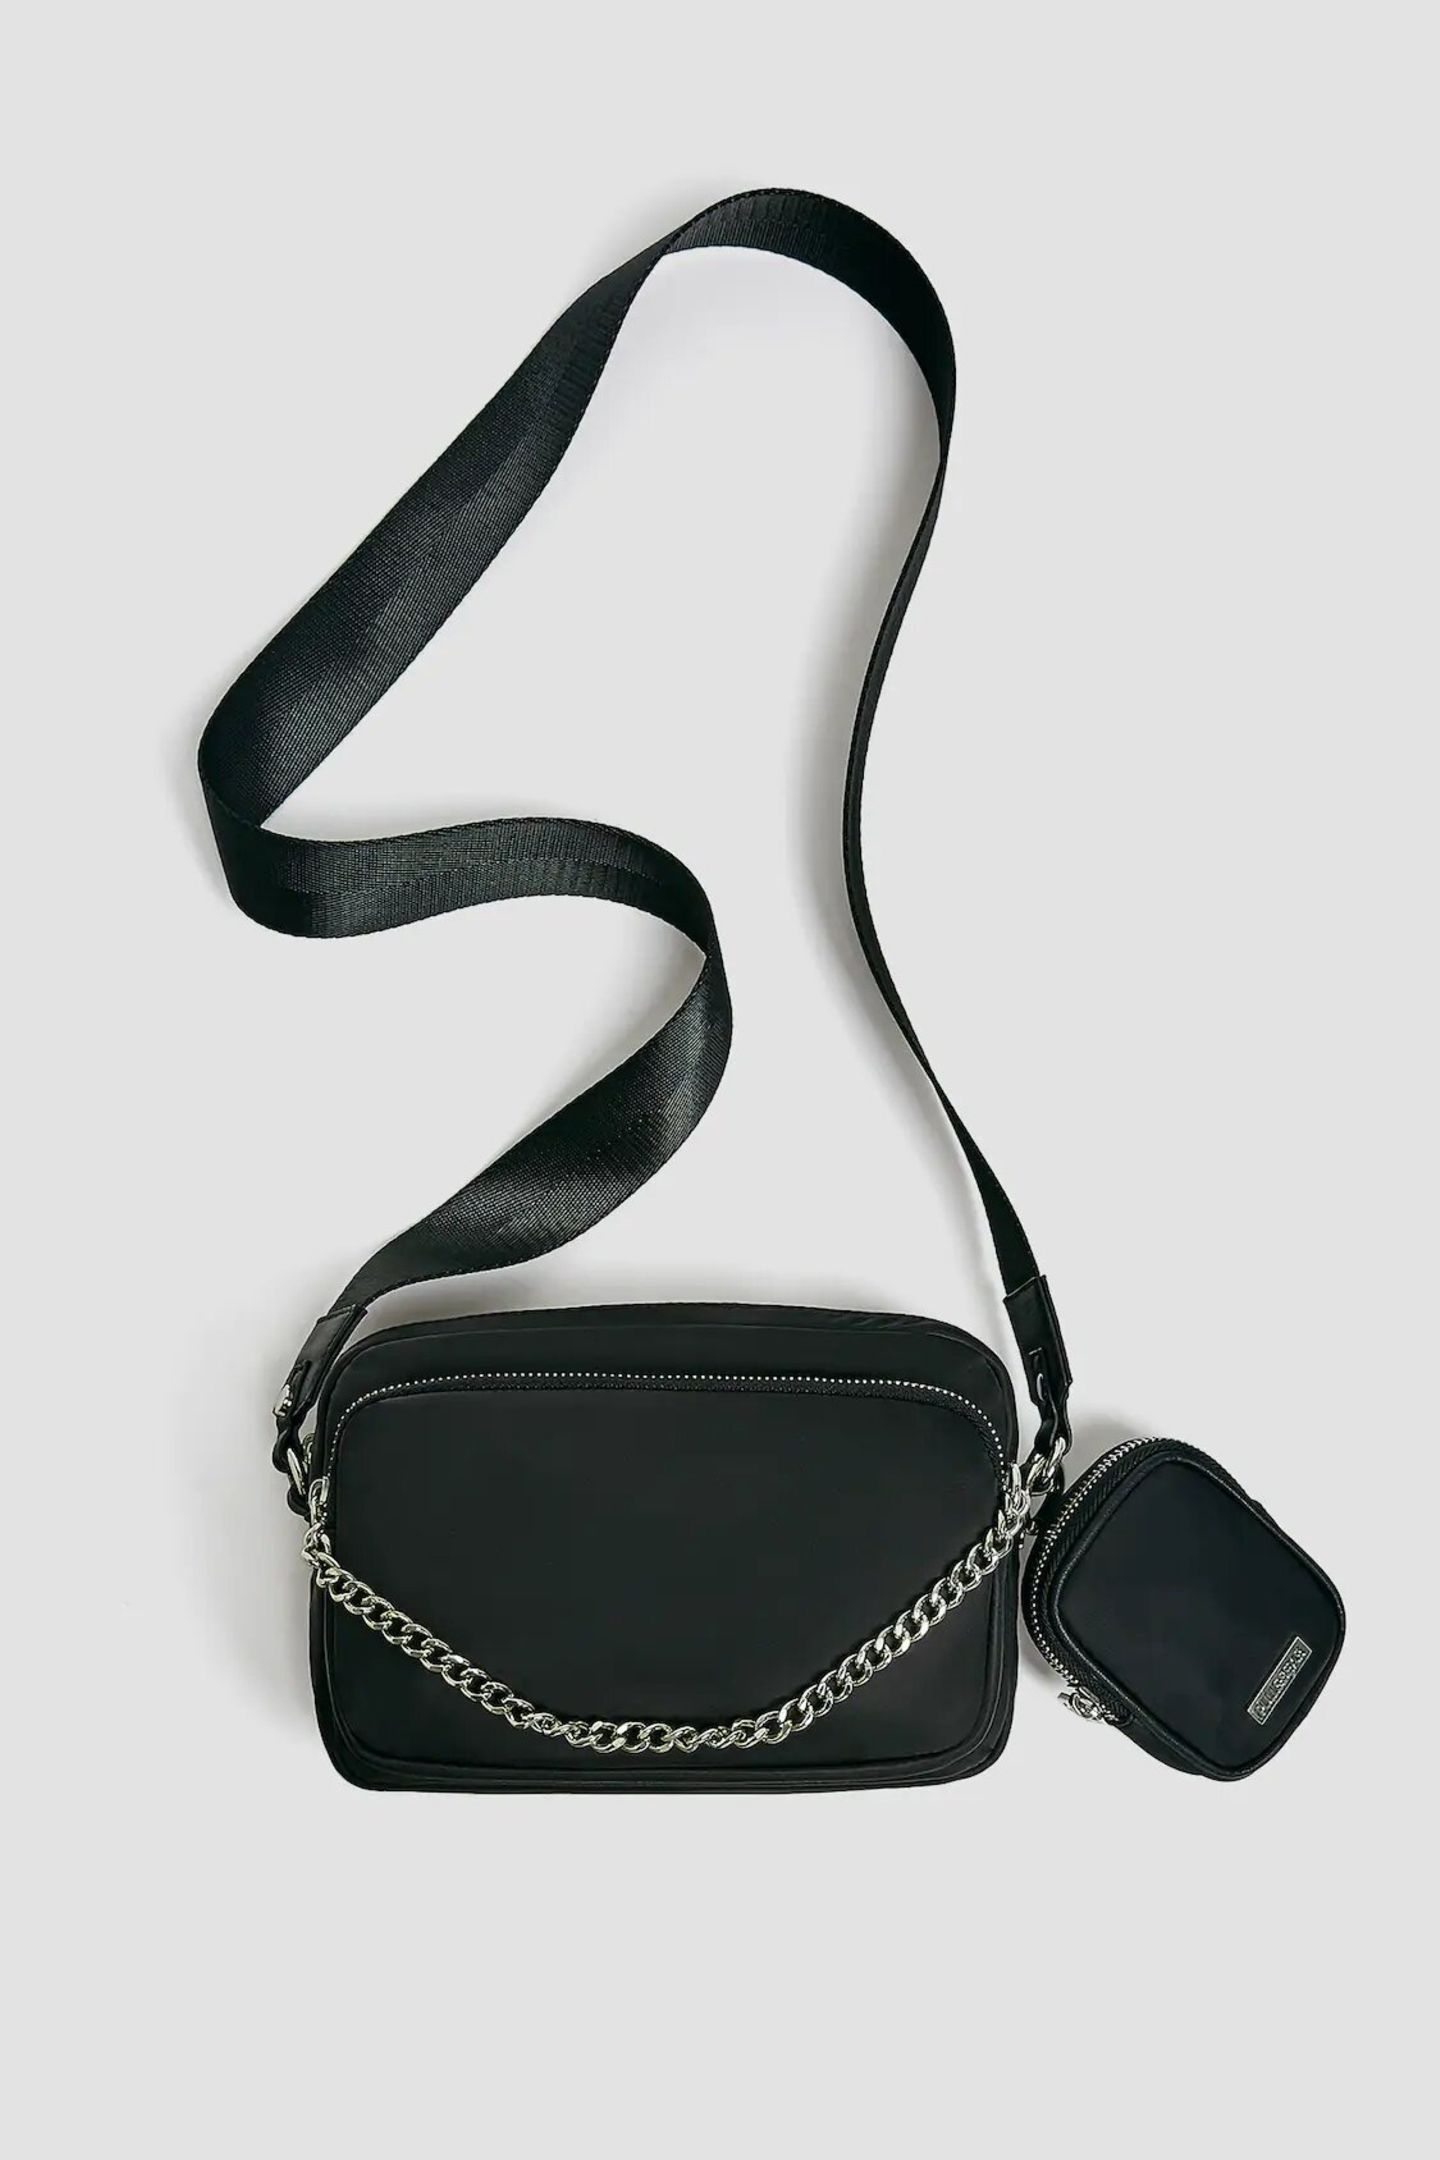 Crossbody-Bags: Pull and Bear tasche schwarz